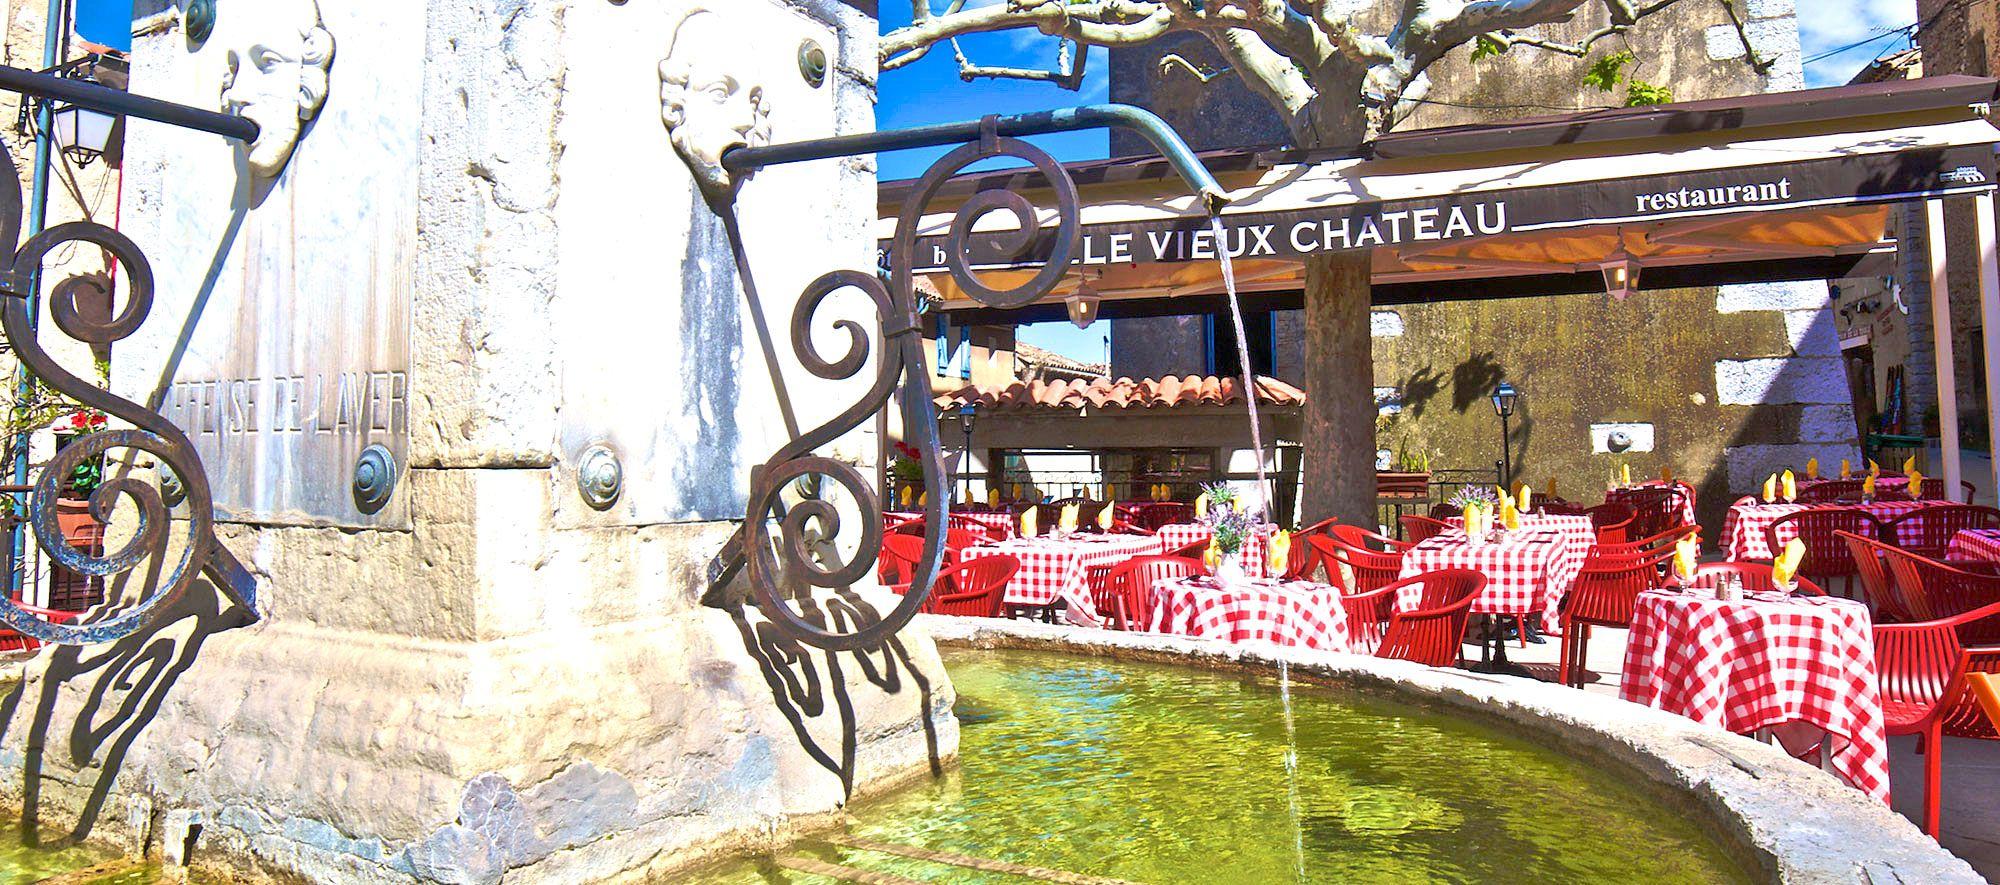 hotel-restaurant-aiguines-verdon-hotel-1